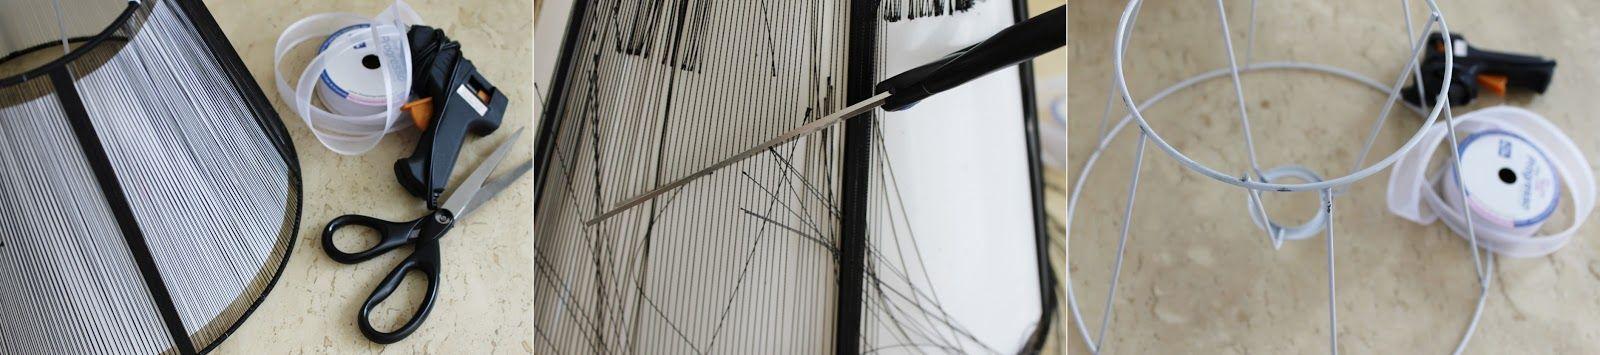 DIY: Cúpula de abajur revestida com fita